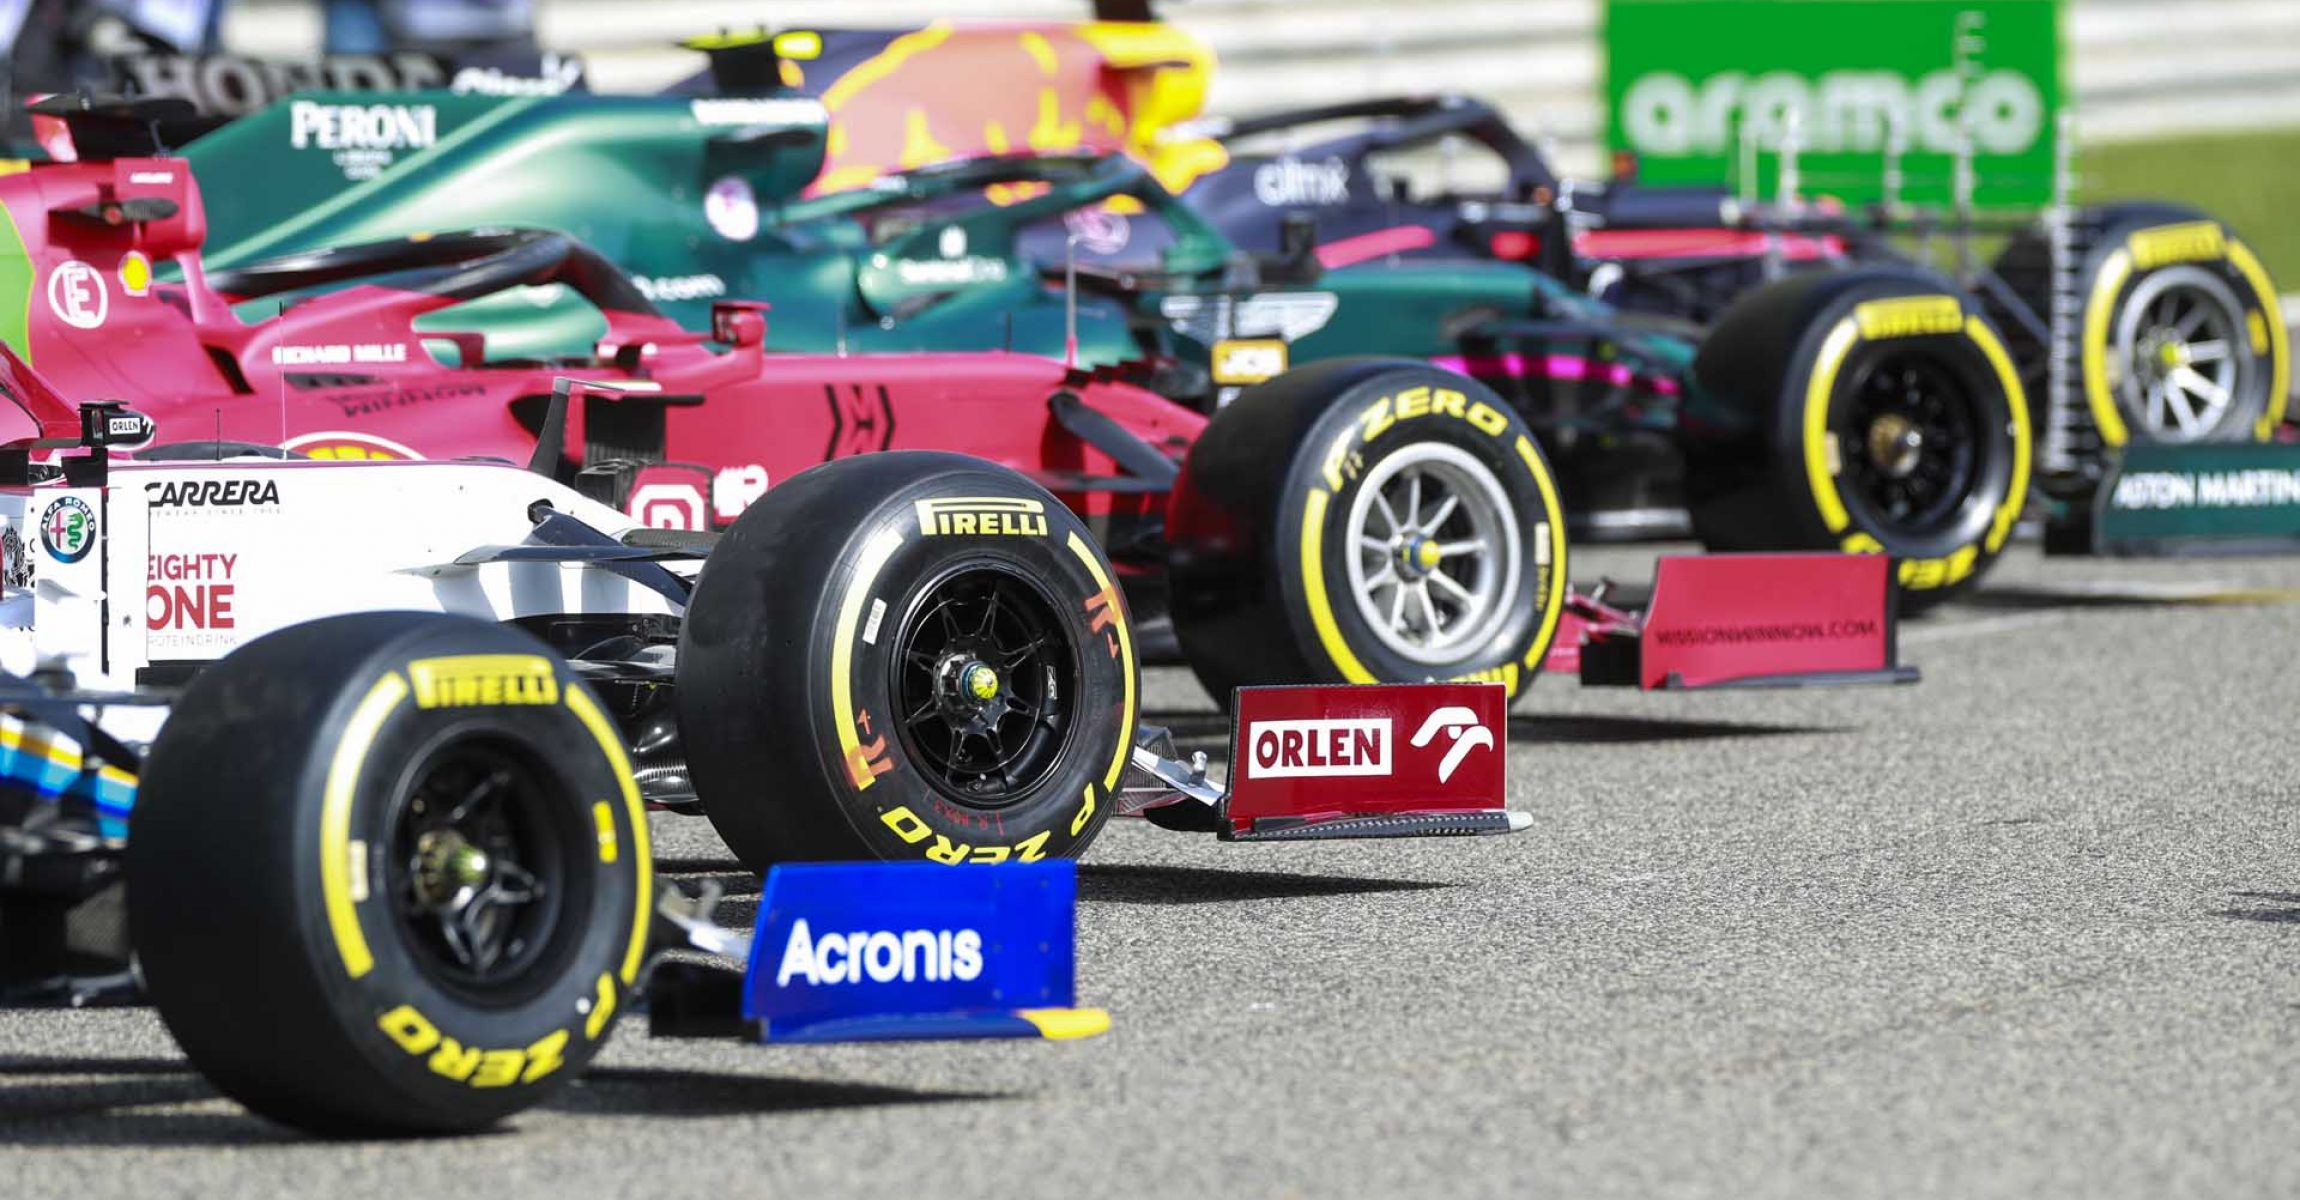 BAHRAIN INTERNATIONAL CIRCUIT, BAHRAIN - MARCH 12: Pirelli tires on the Alfa Romeo Racing C41 during the Bahrain March testing at Bahrain International Circuit on Friday March 12, 2021 in Sakhir, Bahrain. (Photo by Steven Tee / LAT Images)